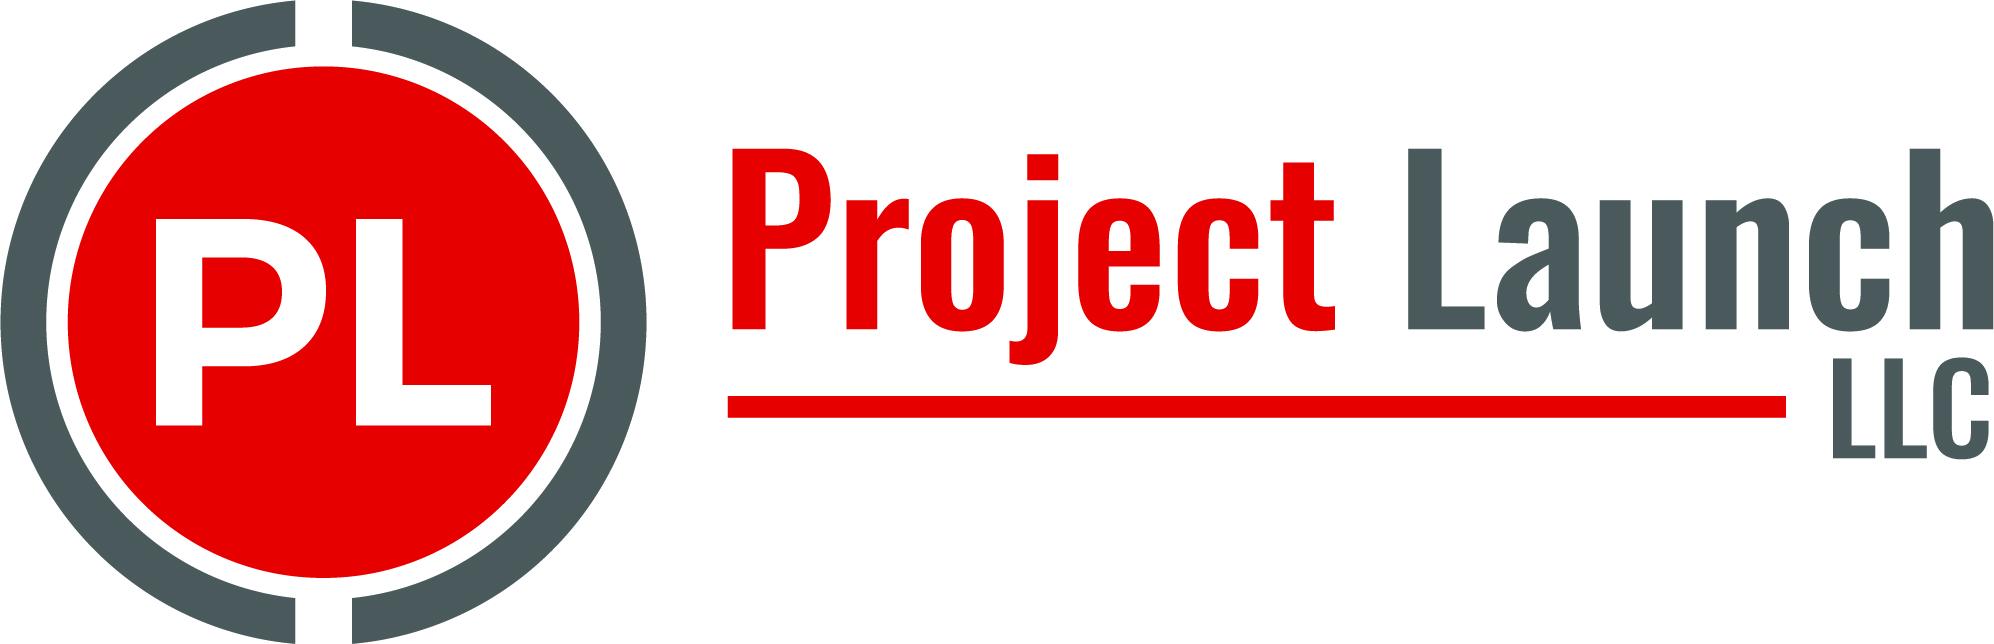 Project Launch LLC